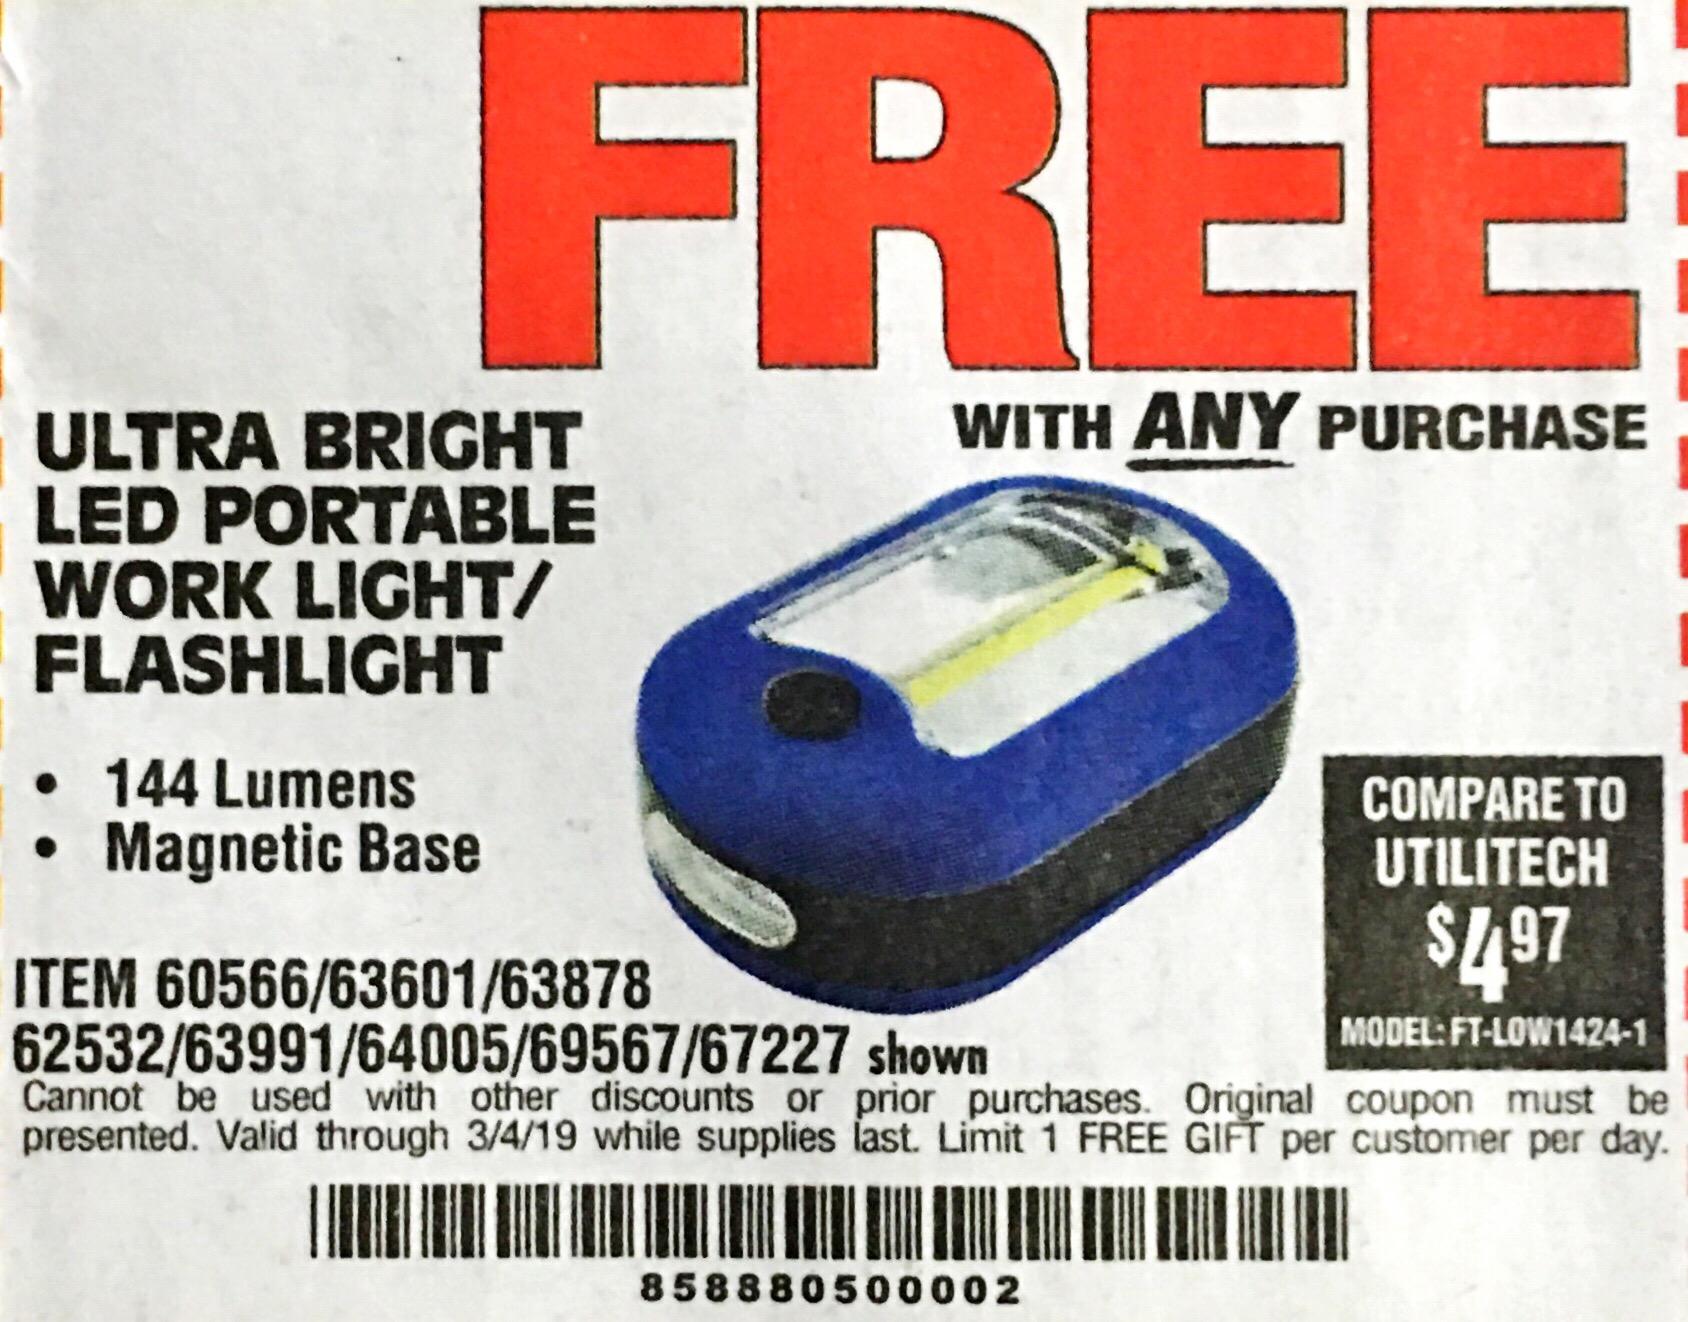 www.hfqpdb.com - LED PORTABLE WORKLIGHT/FLASHLIGHT Lot No. 63878/63991/64005/69567/60566/63601/67227